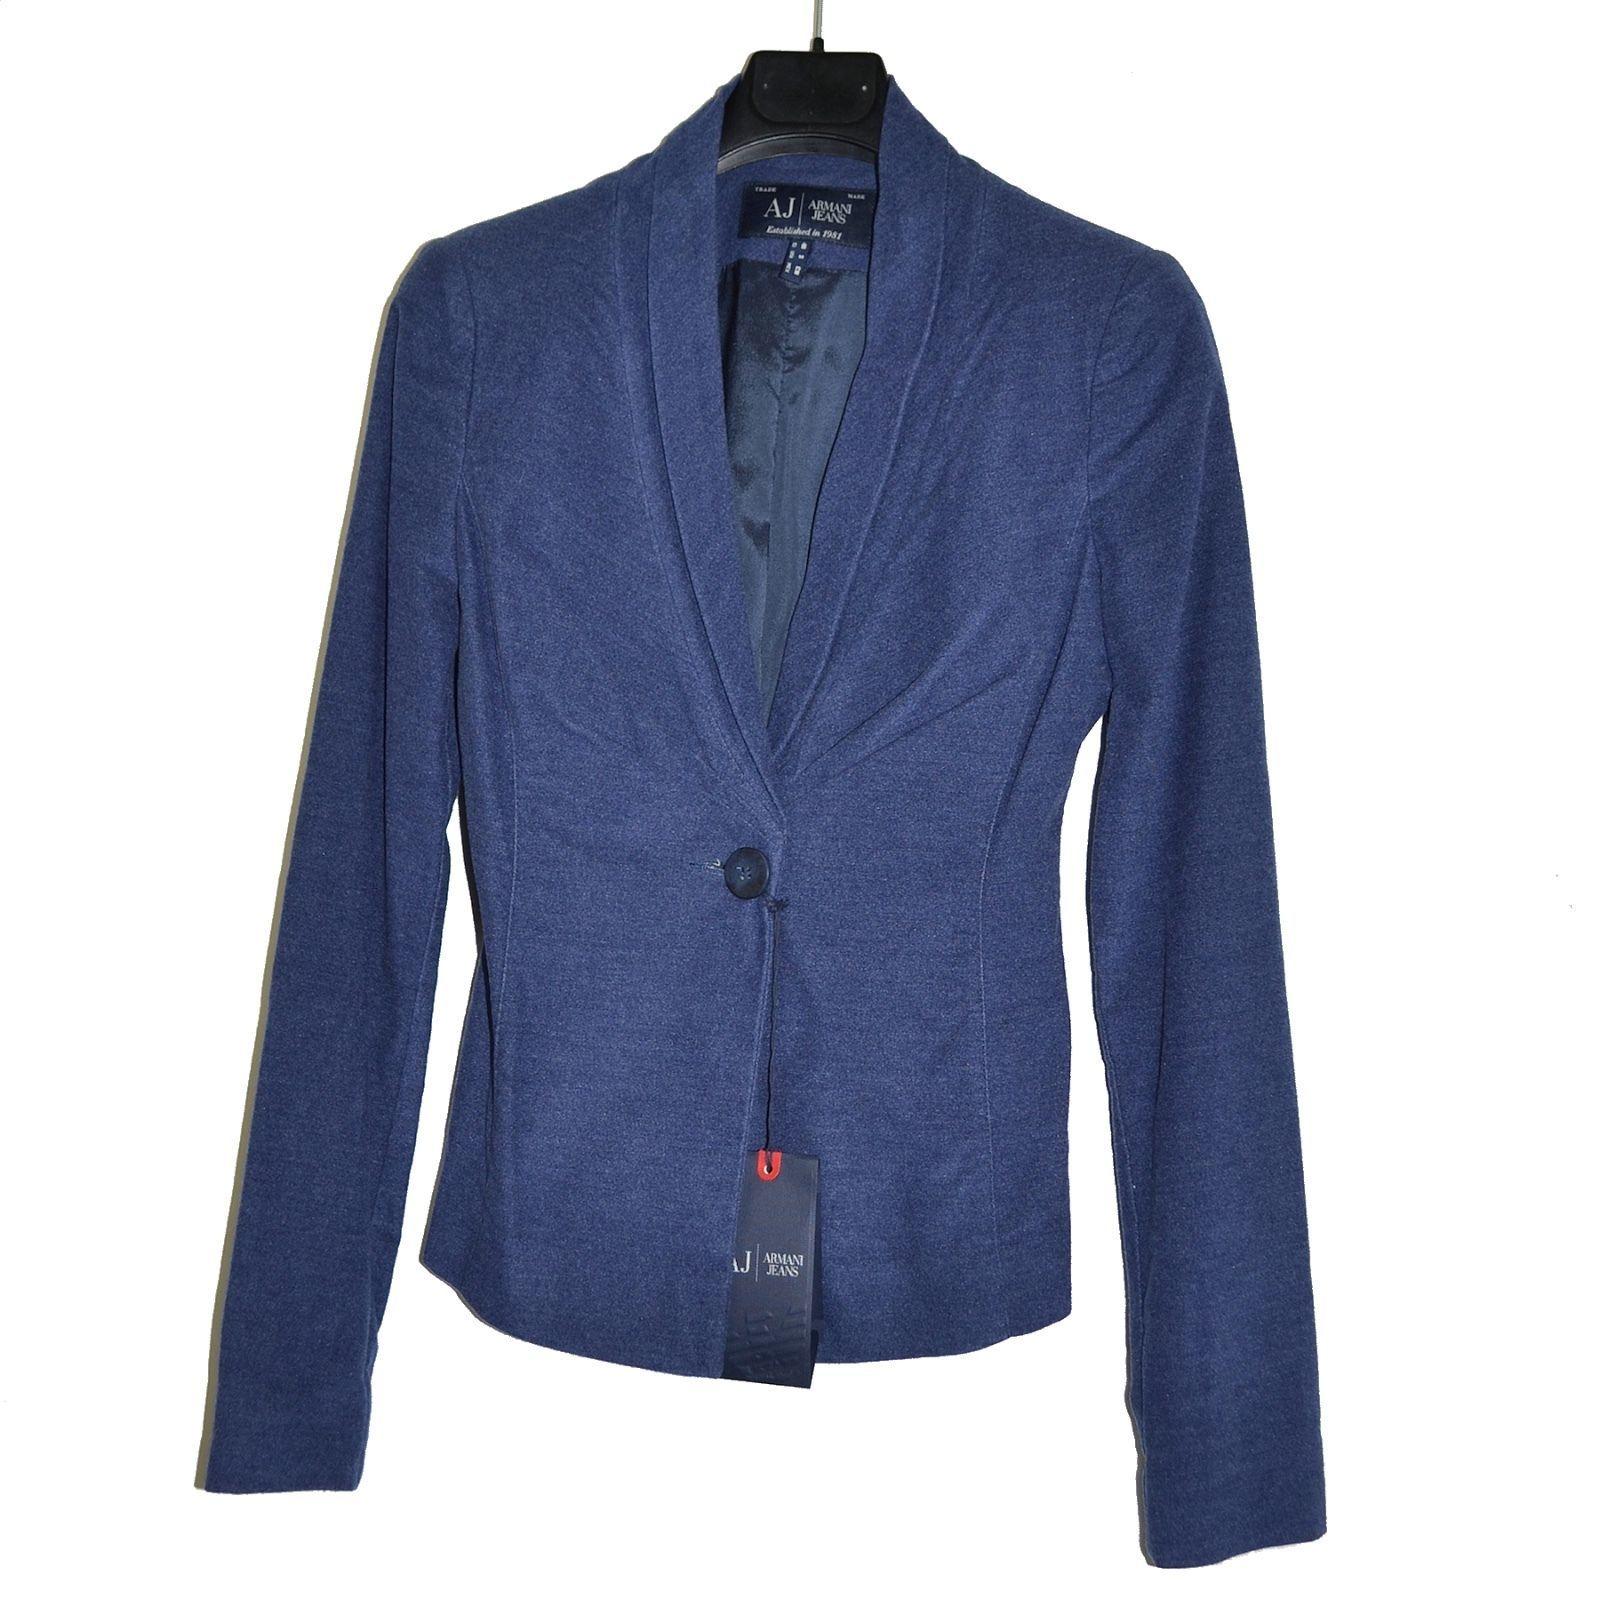 52b1db19af6 Armani J EAN S Veste Viscose Coton Palton S and similar items